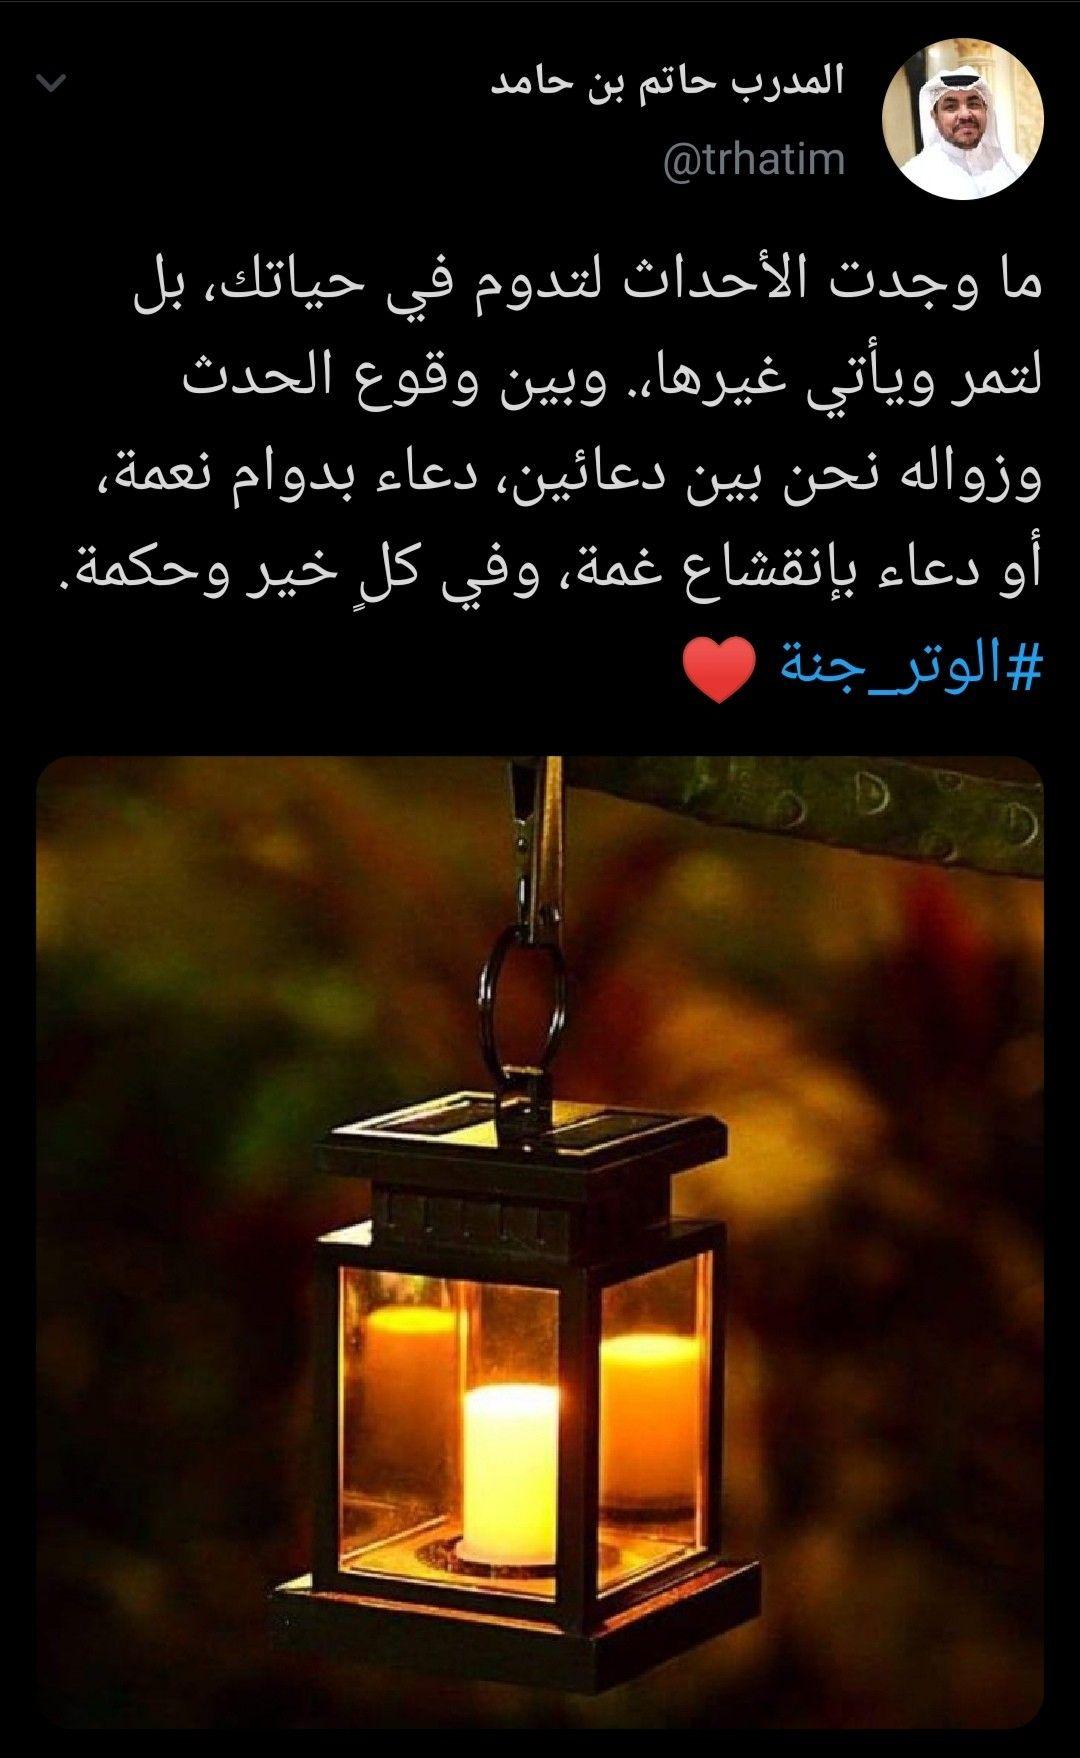 Pin By Hatim Bin Hamed On الوتر جنة القلوب Home Decor Decor Lamp